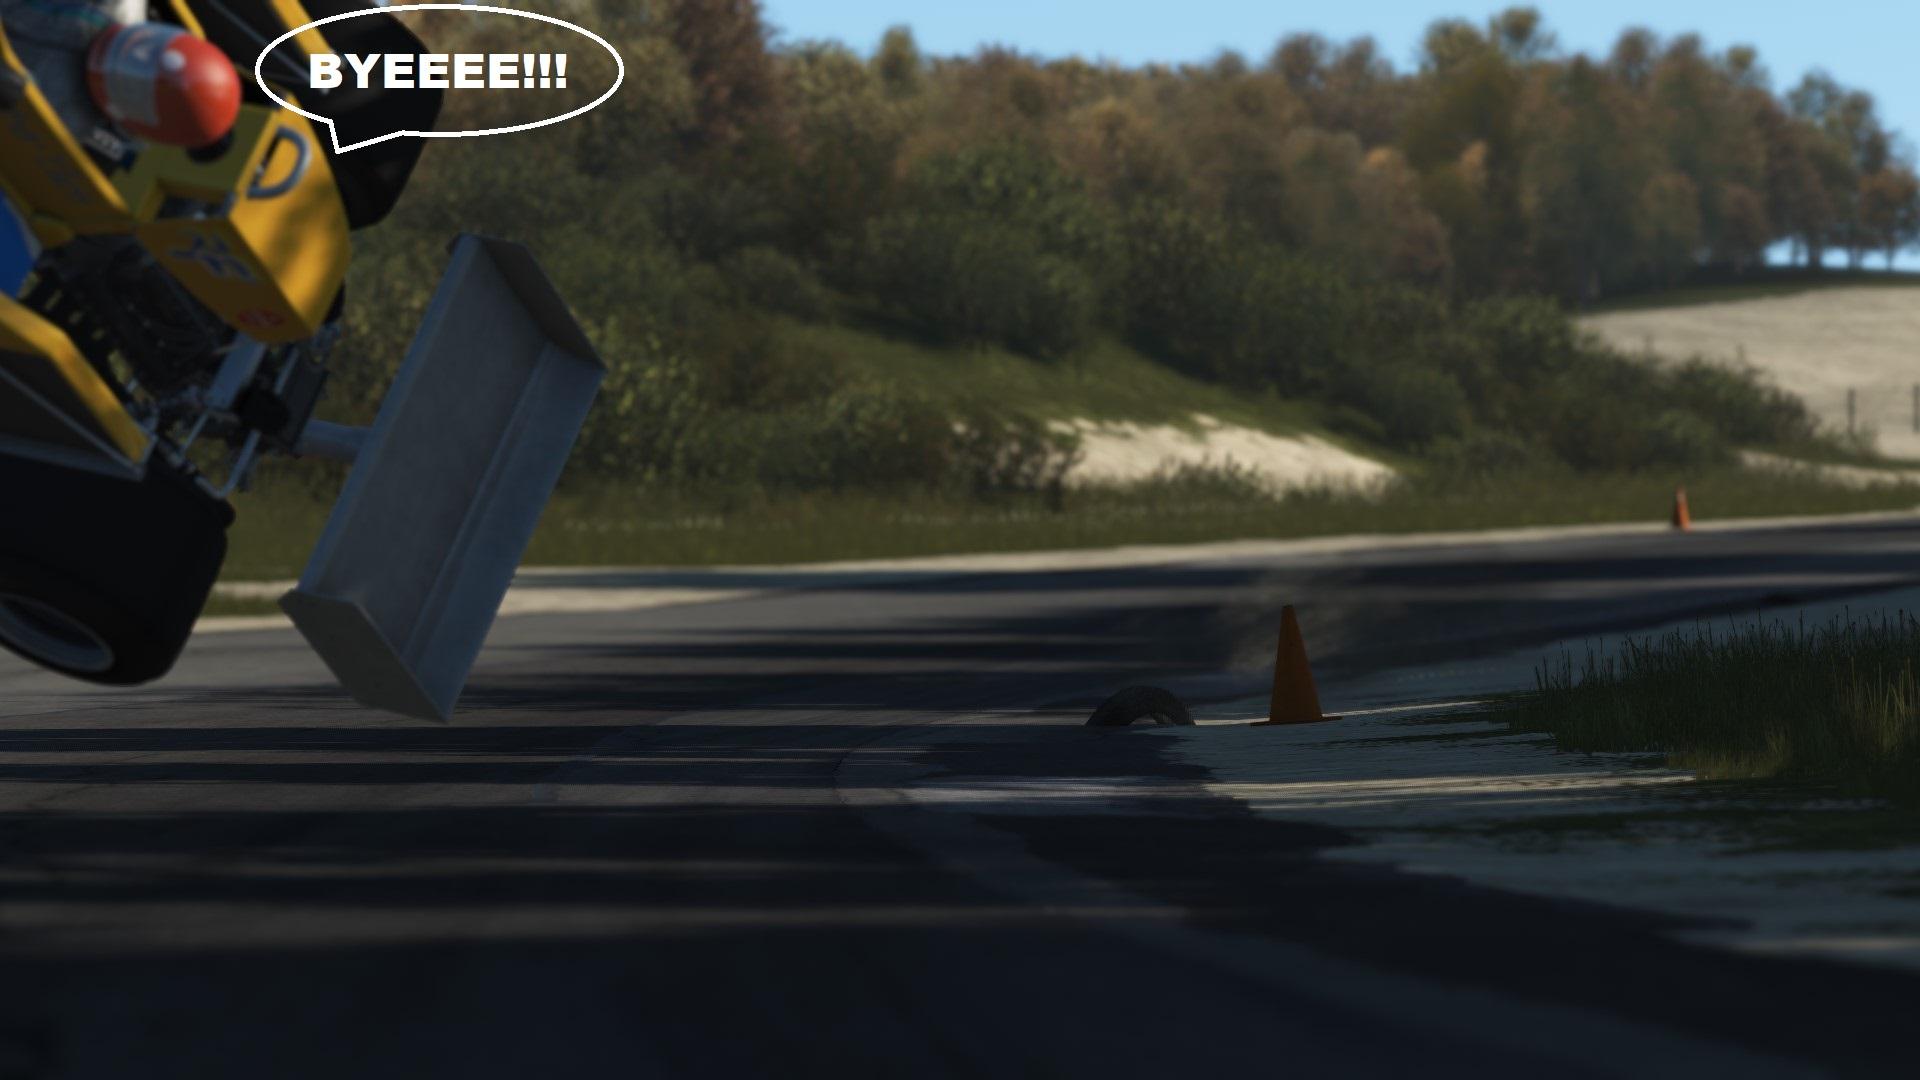 swoosh2.jpg